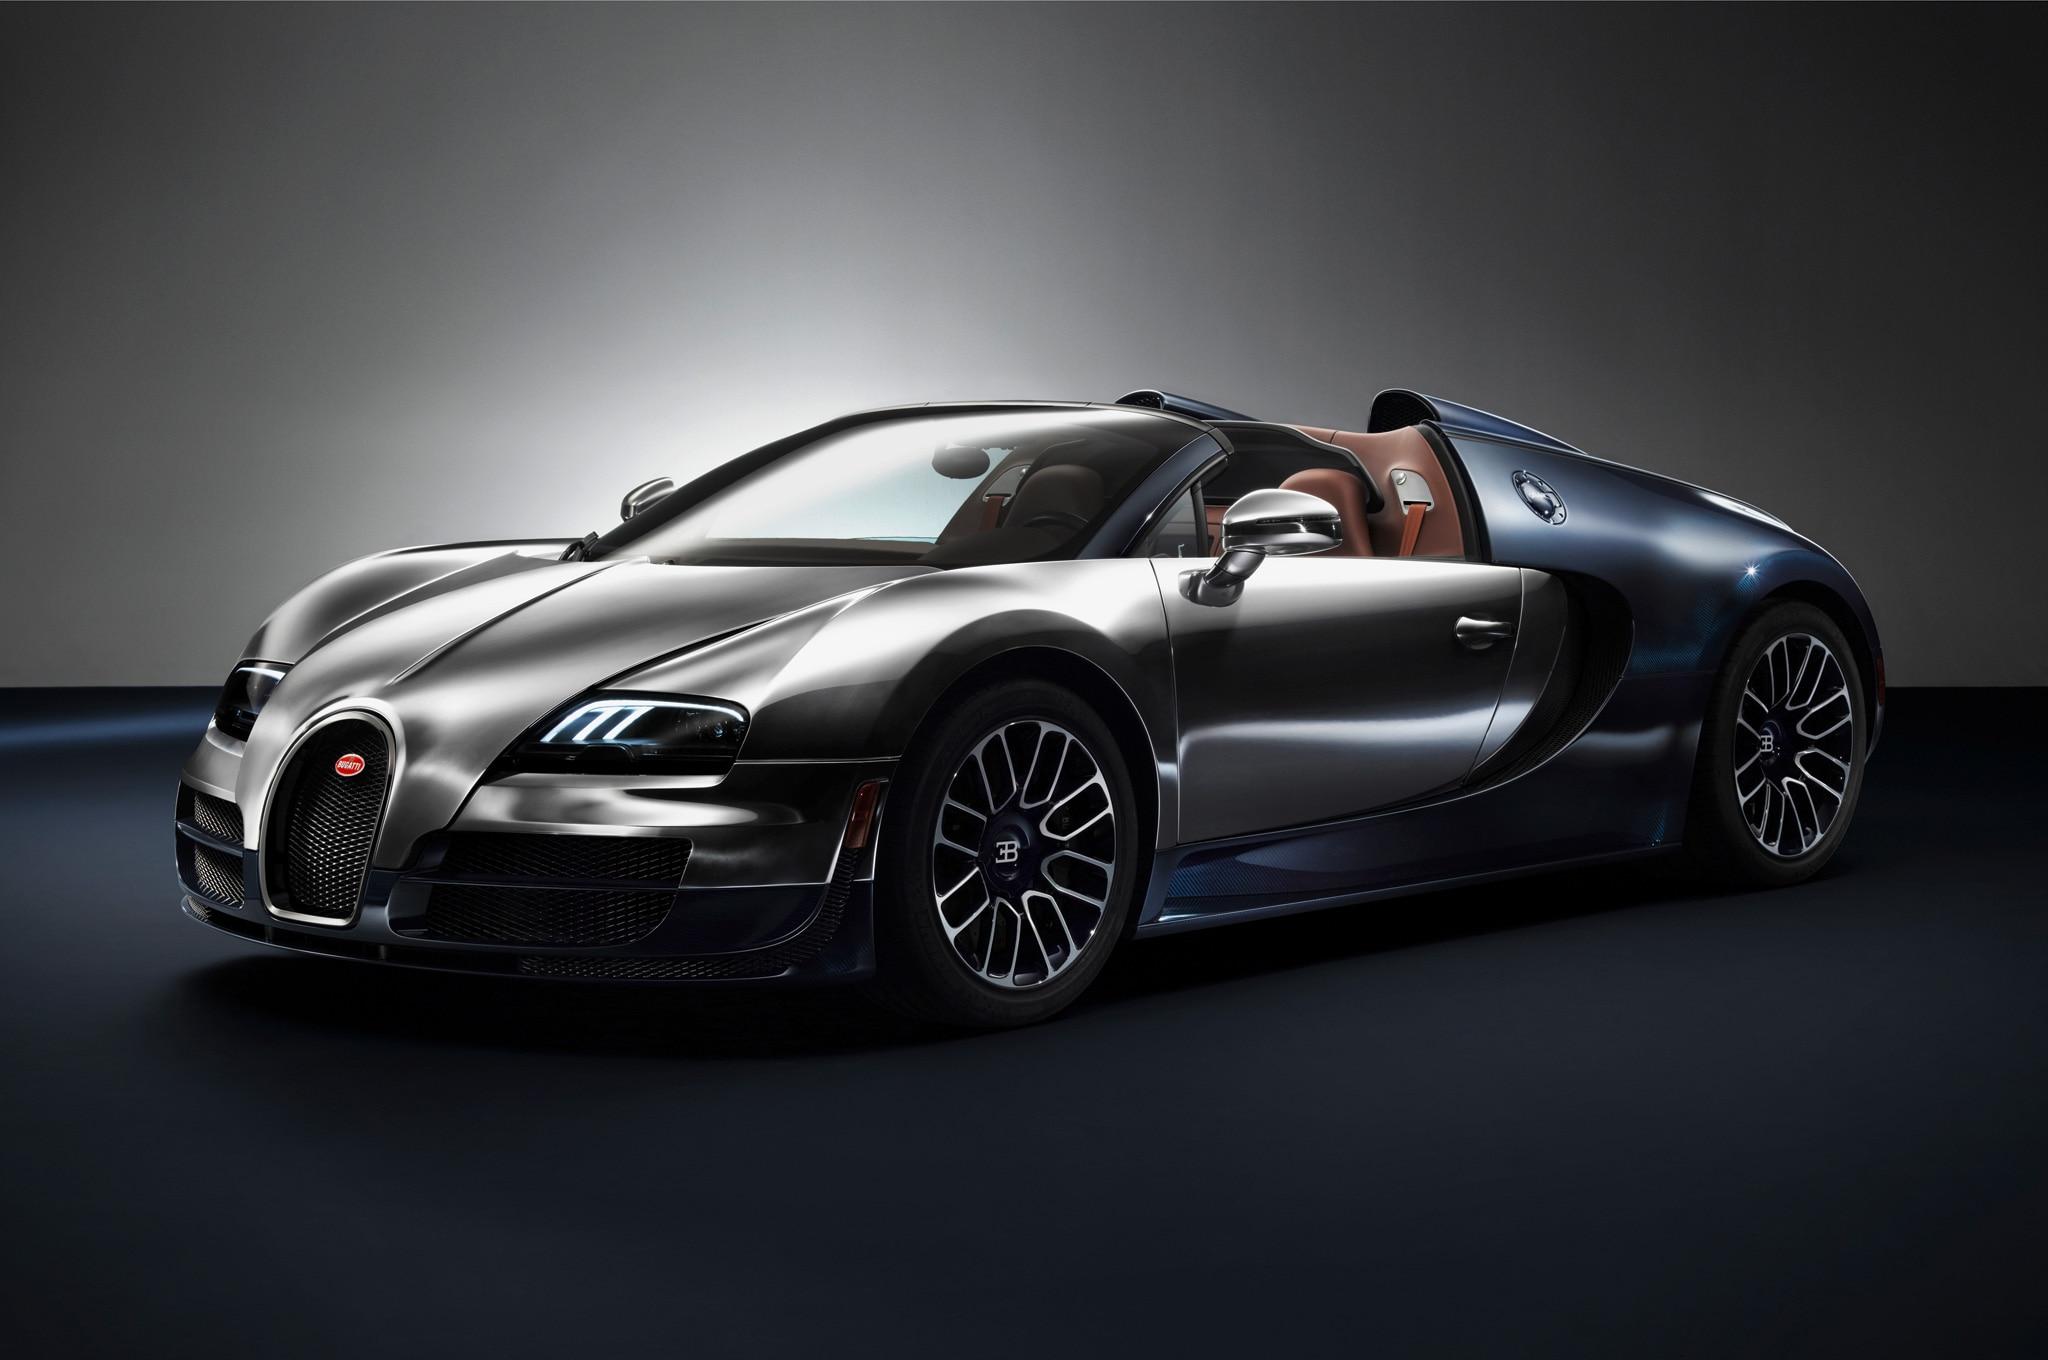 Bugatti Veyron Grand Sport Vitesse Legends Ettore Bugatti Front Three Quarter1